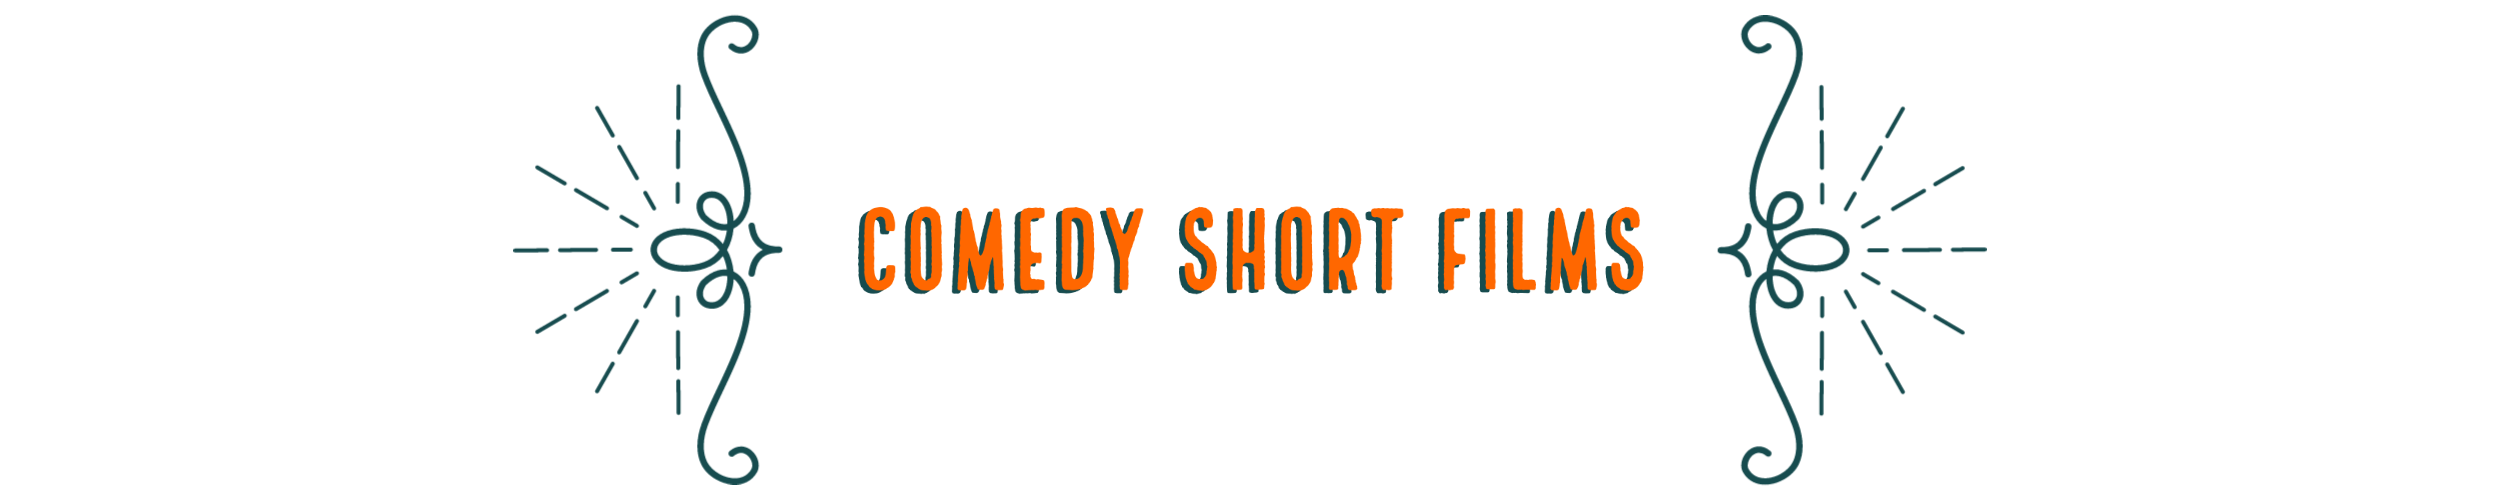 Comedy Short Films